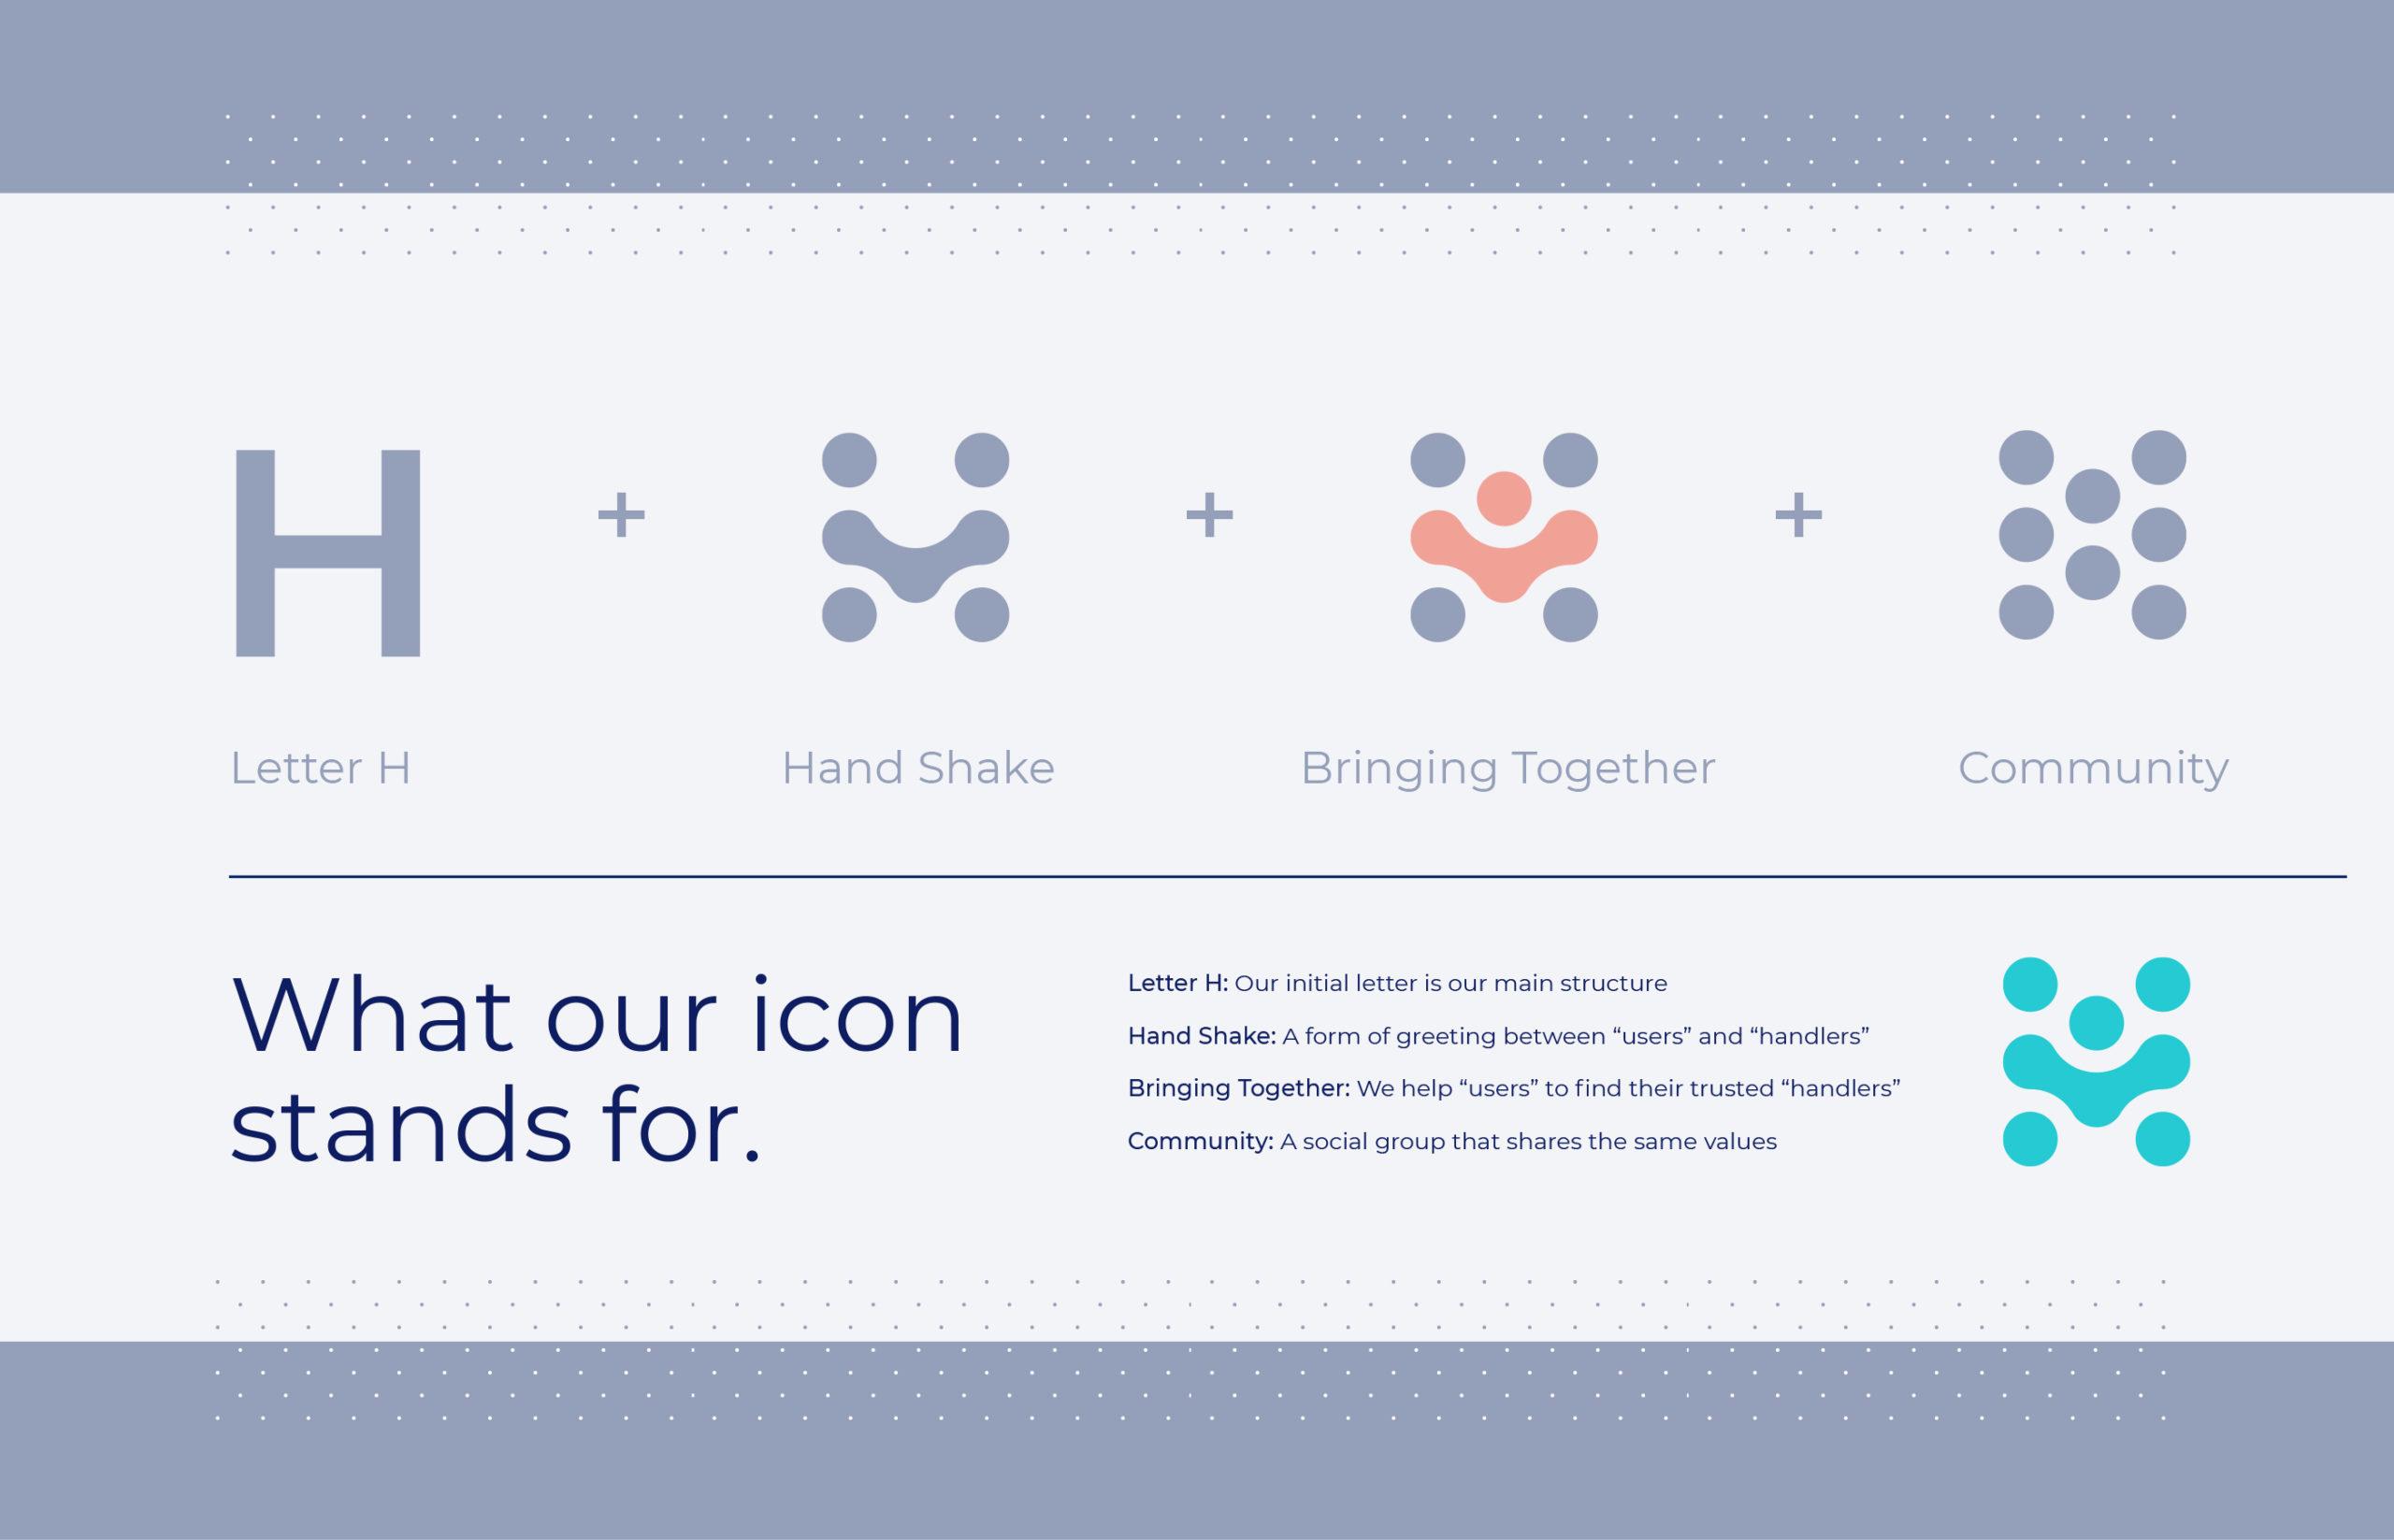 Description of Handle for Me brand icon